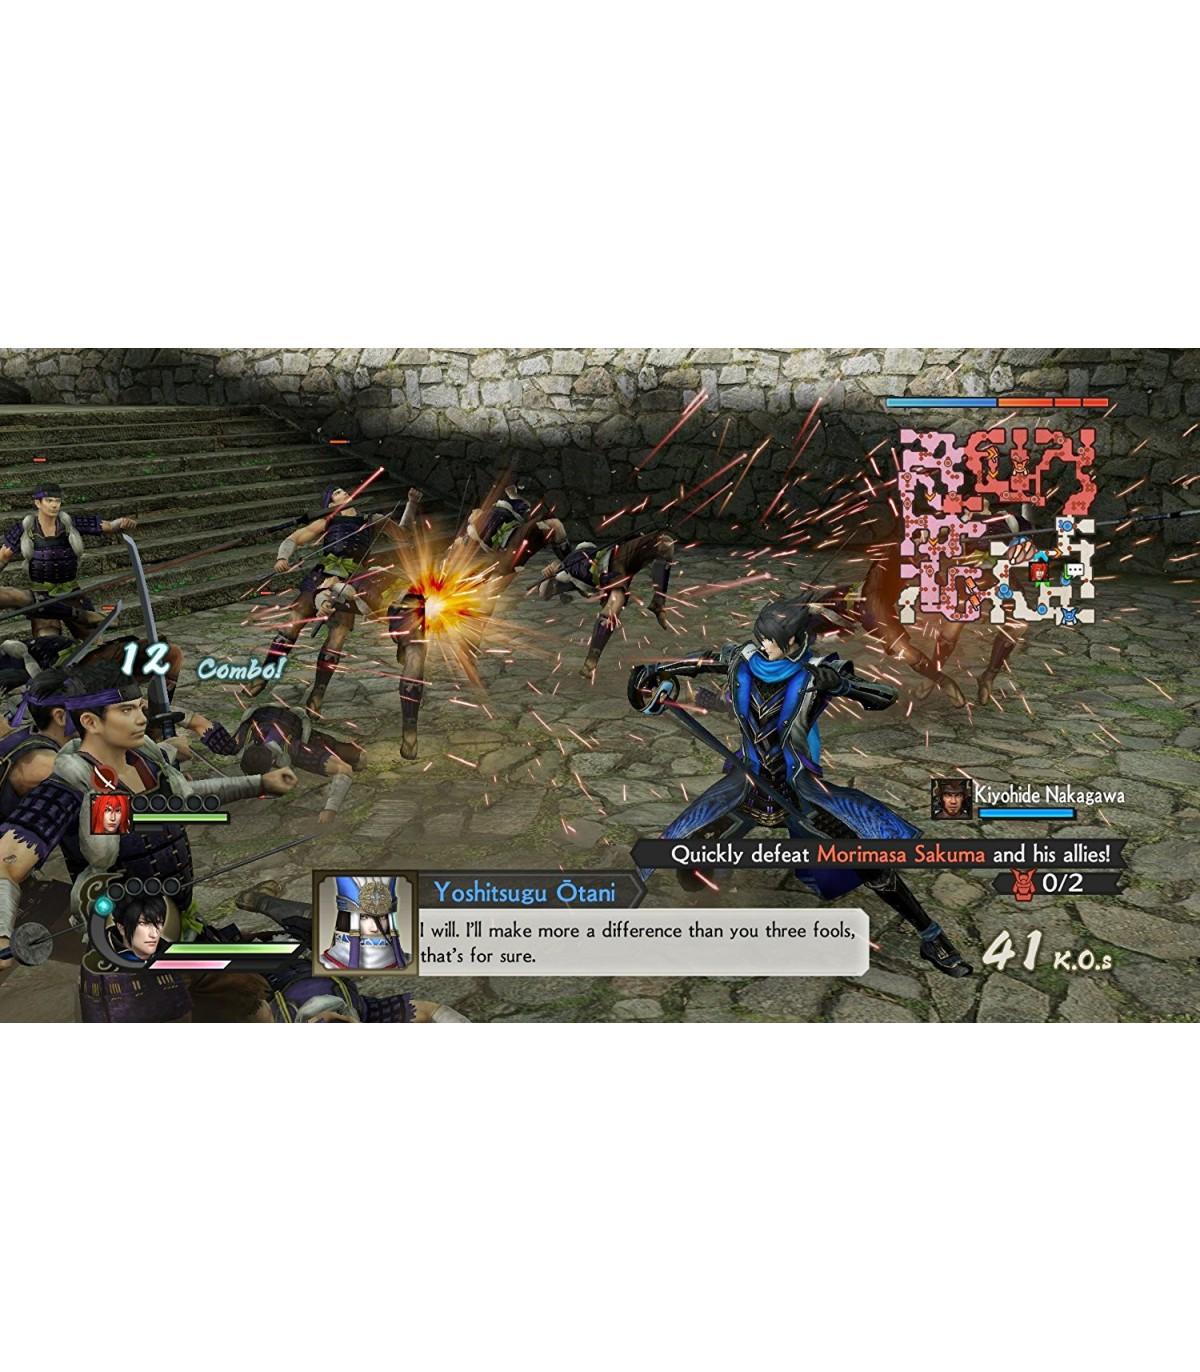 بازی Samurai Warriors 4-II کارکرده - پلی استیشن 4